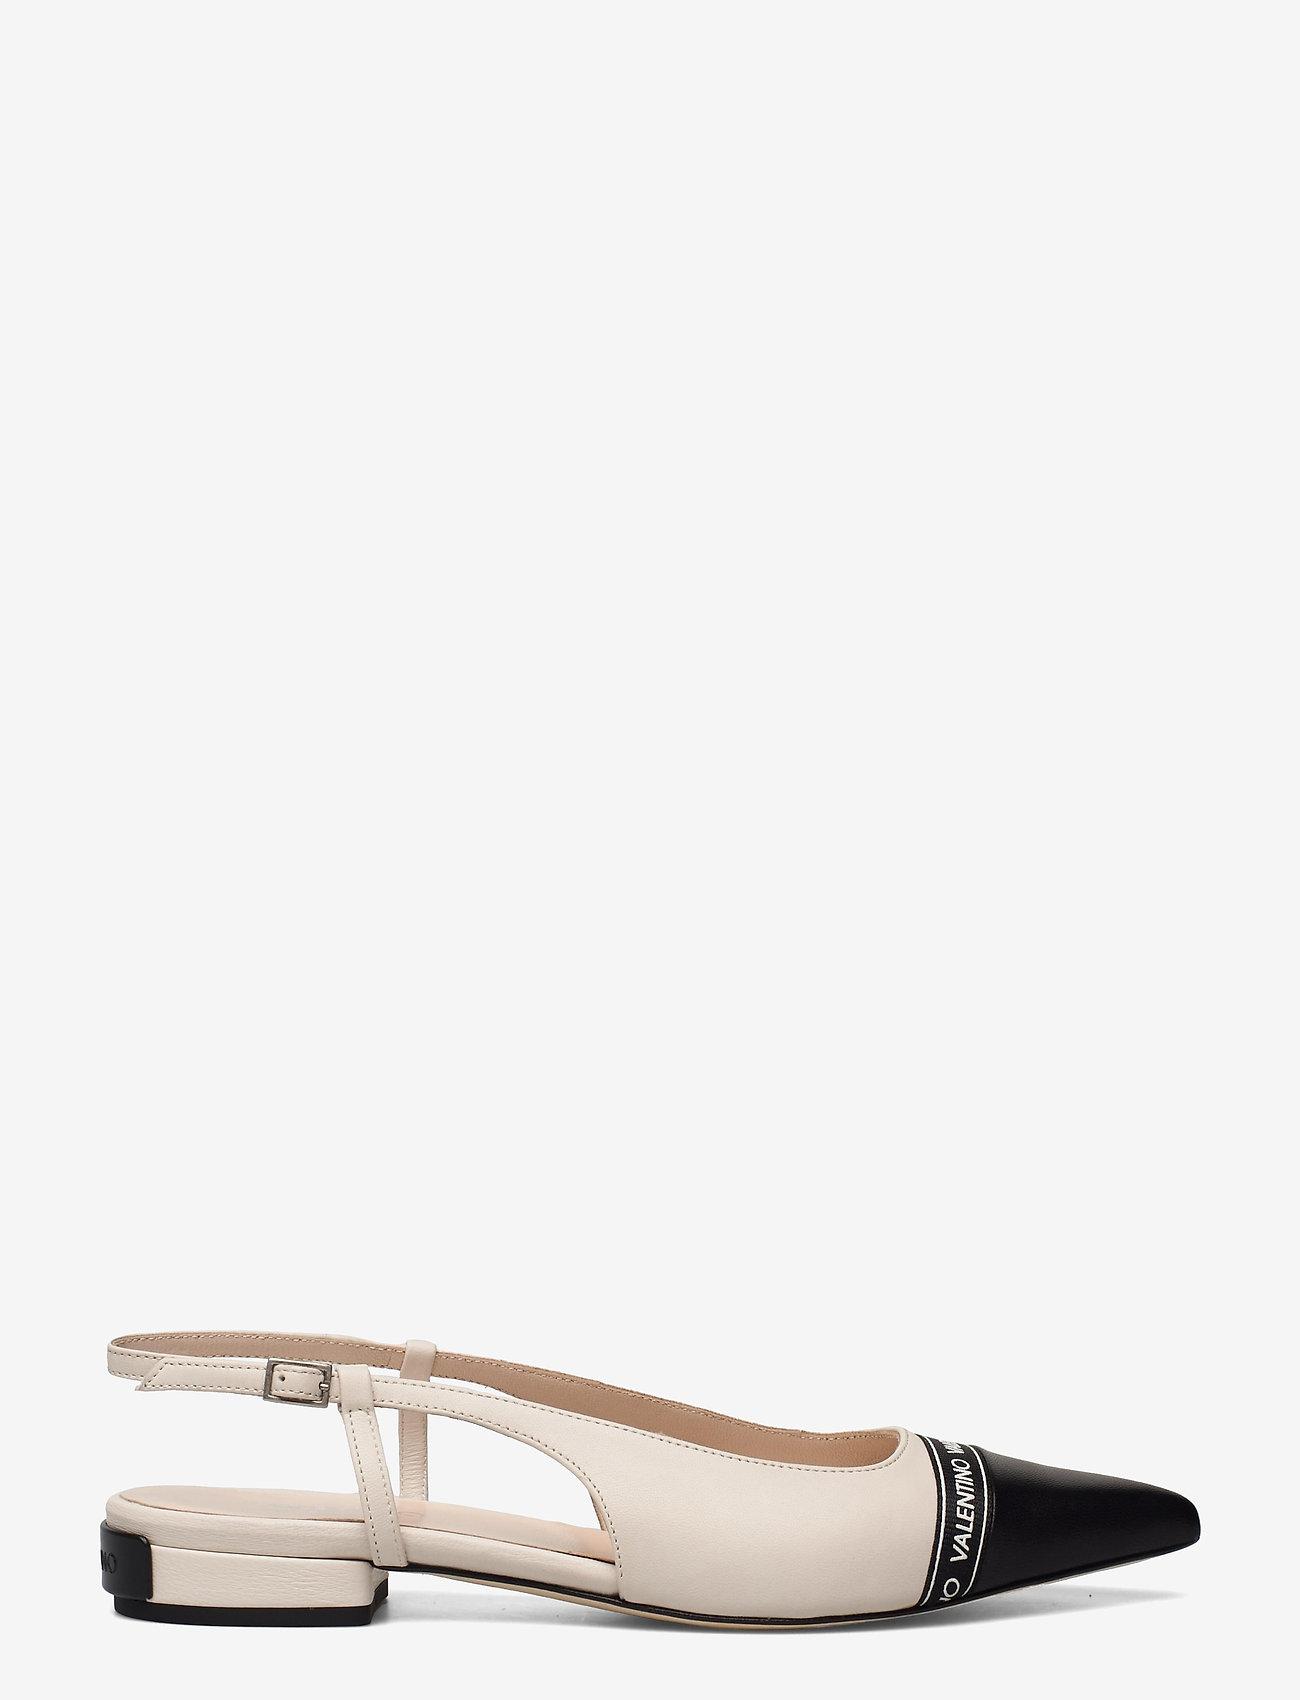 Valentino Shoes - SLINGBACK - ballerinas - white - 1